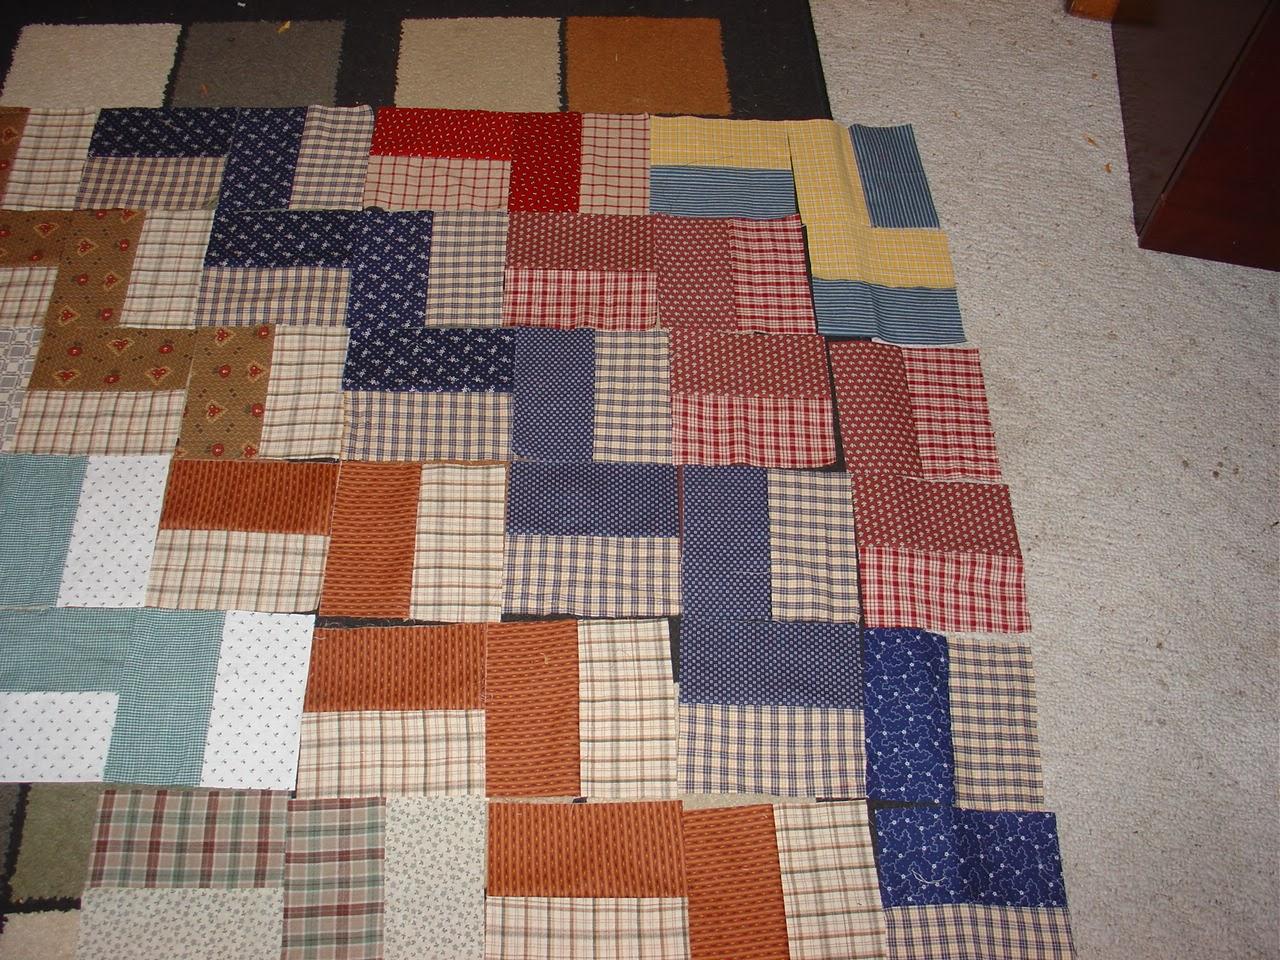 Treadlestitches Endless Stairs Free Pattern